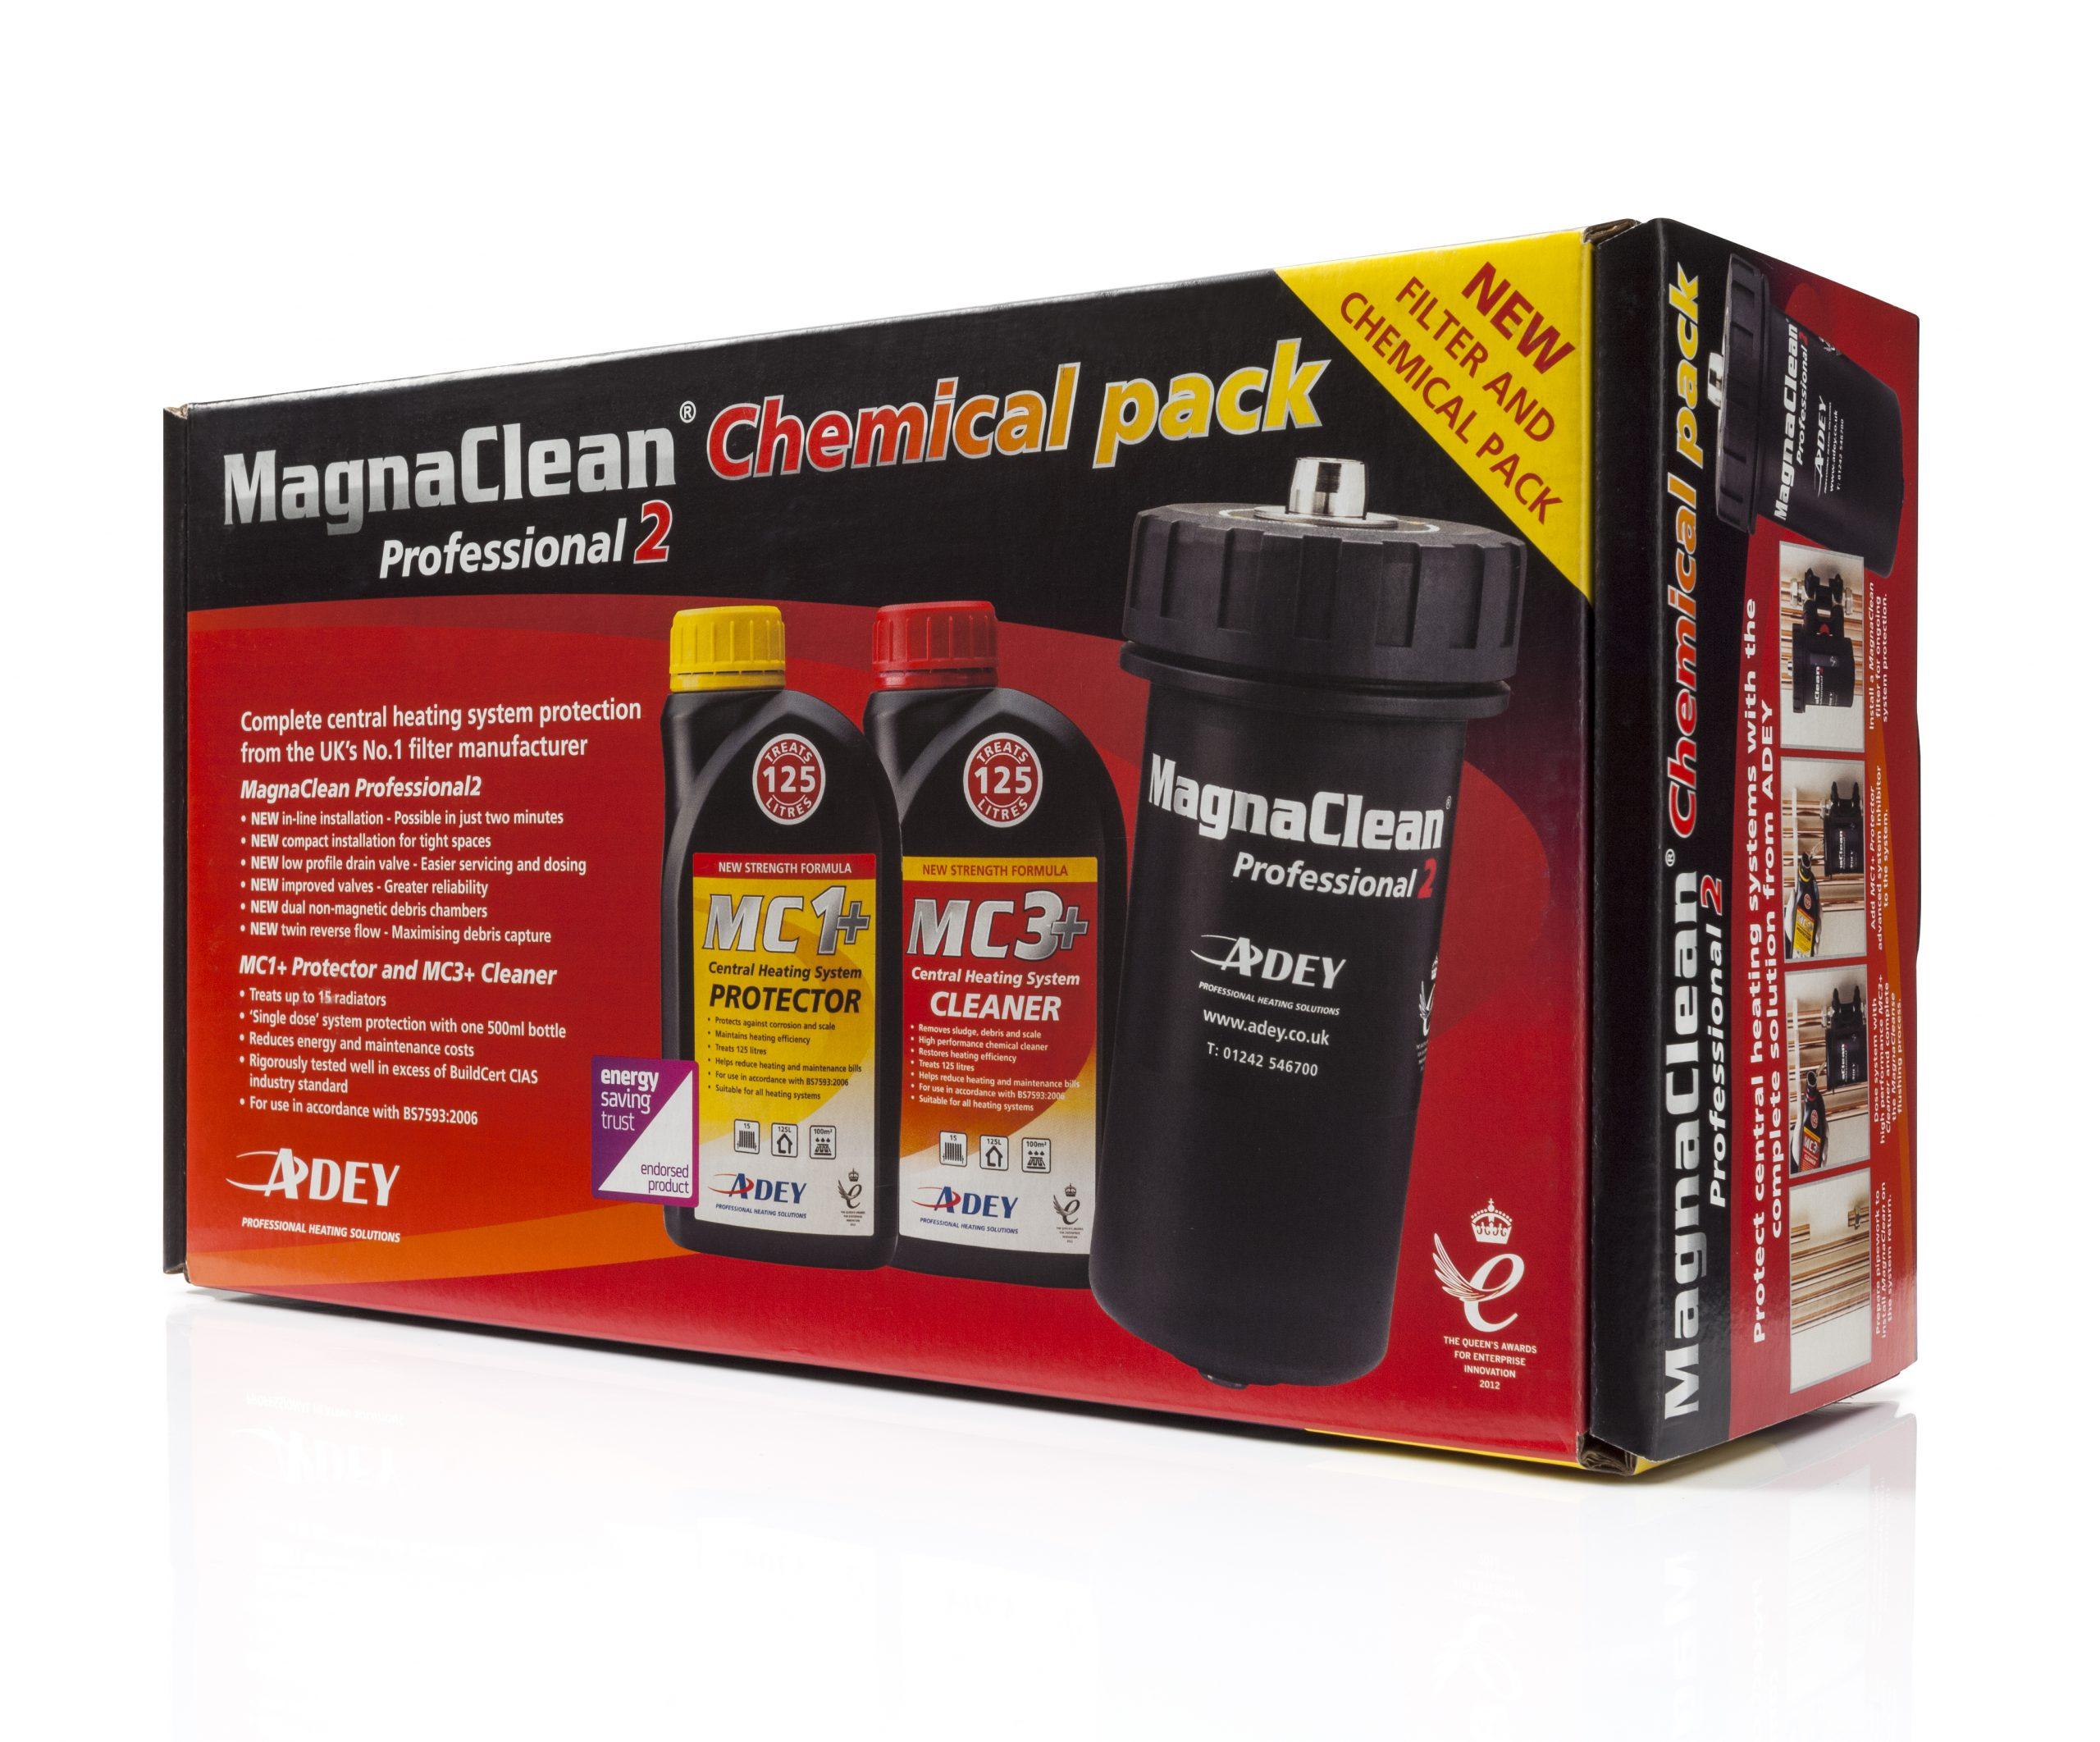 MAGNACLEAN New chemical pack